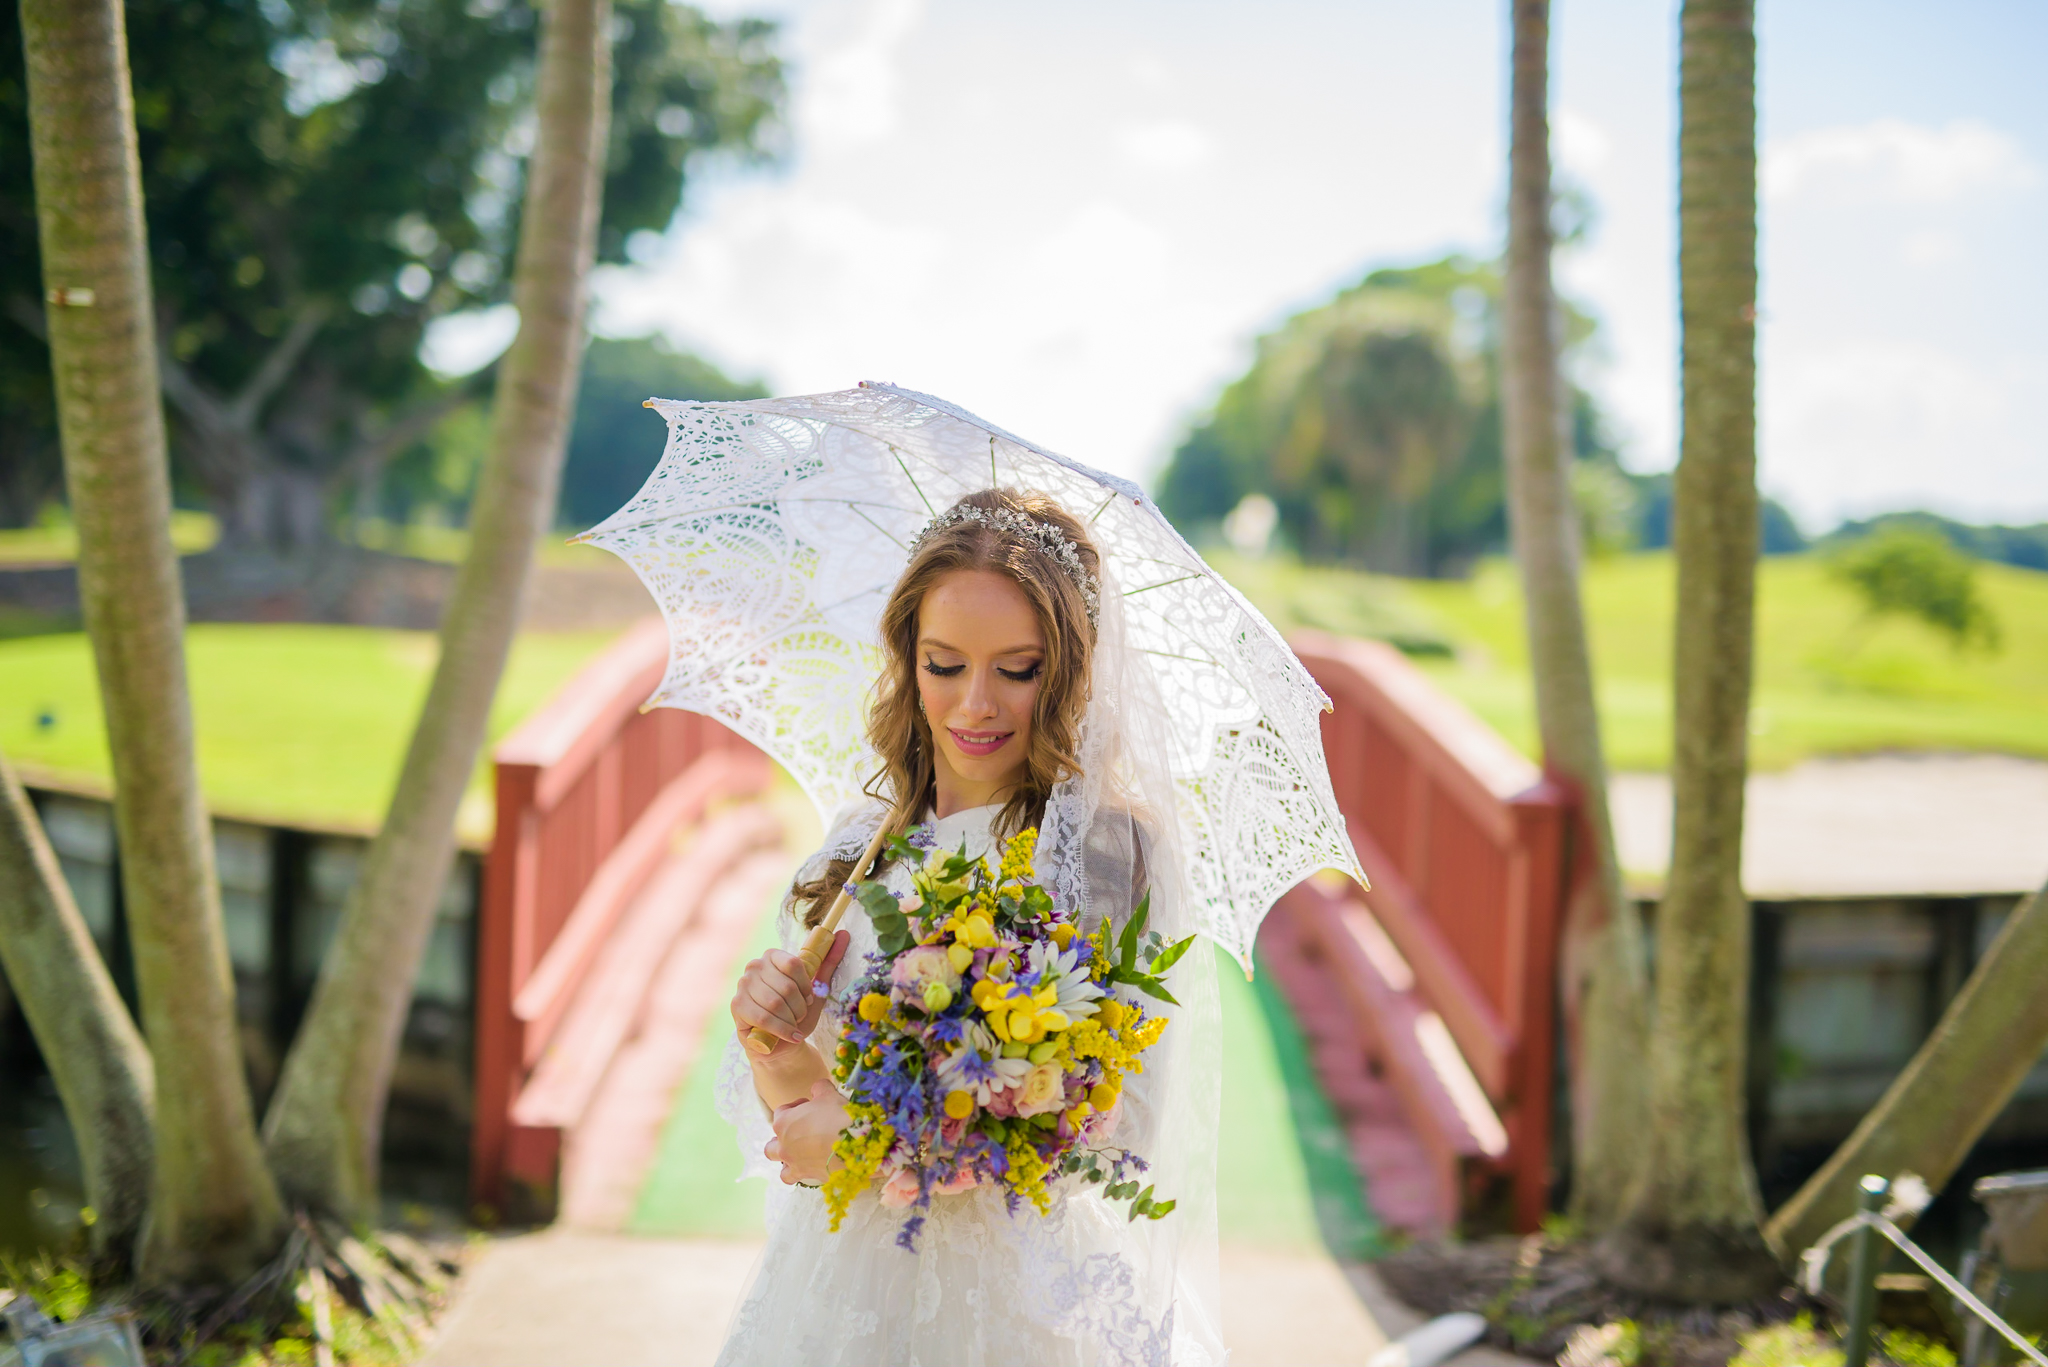 Wedding by Levikfoto.com-019.jpg